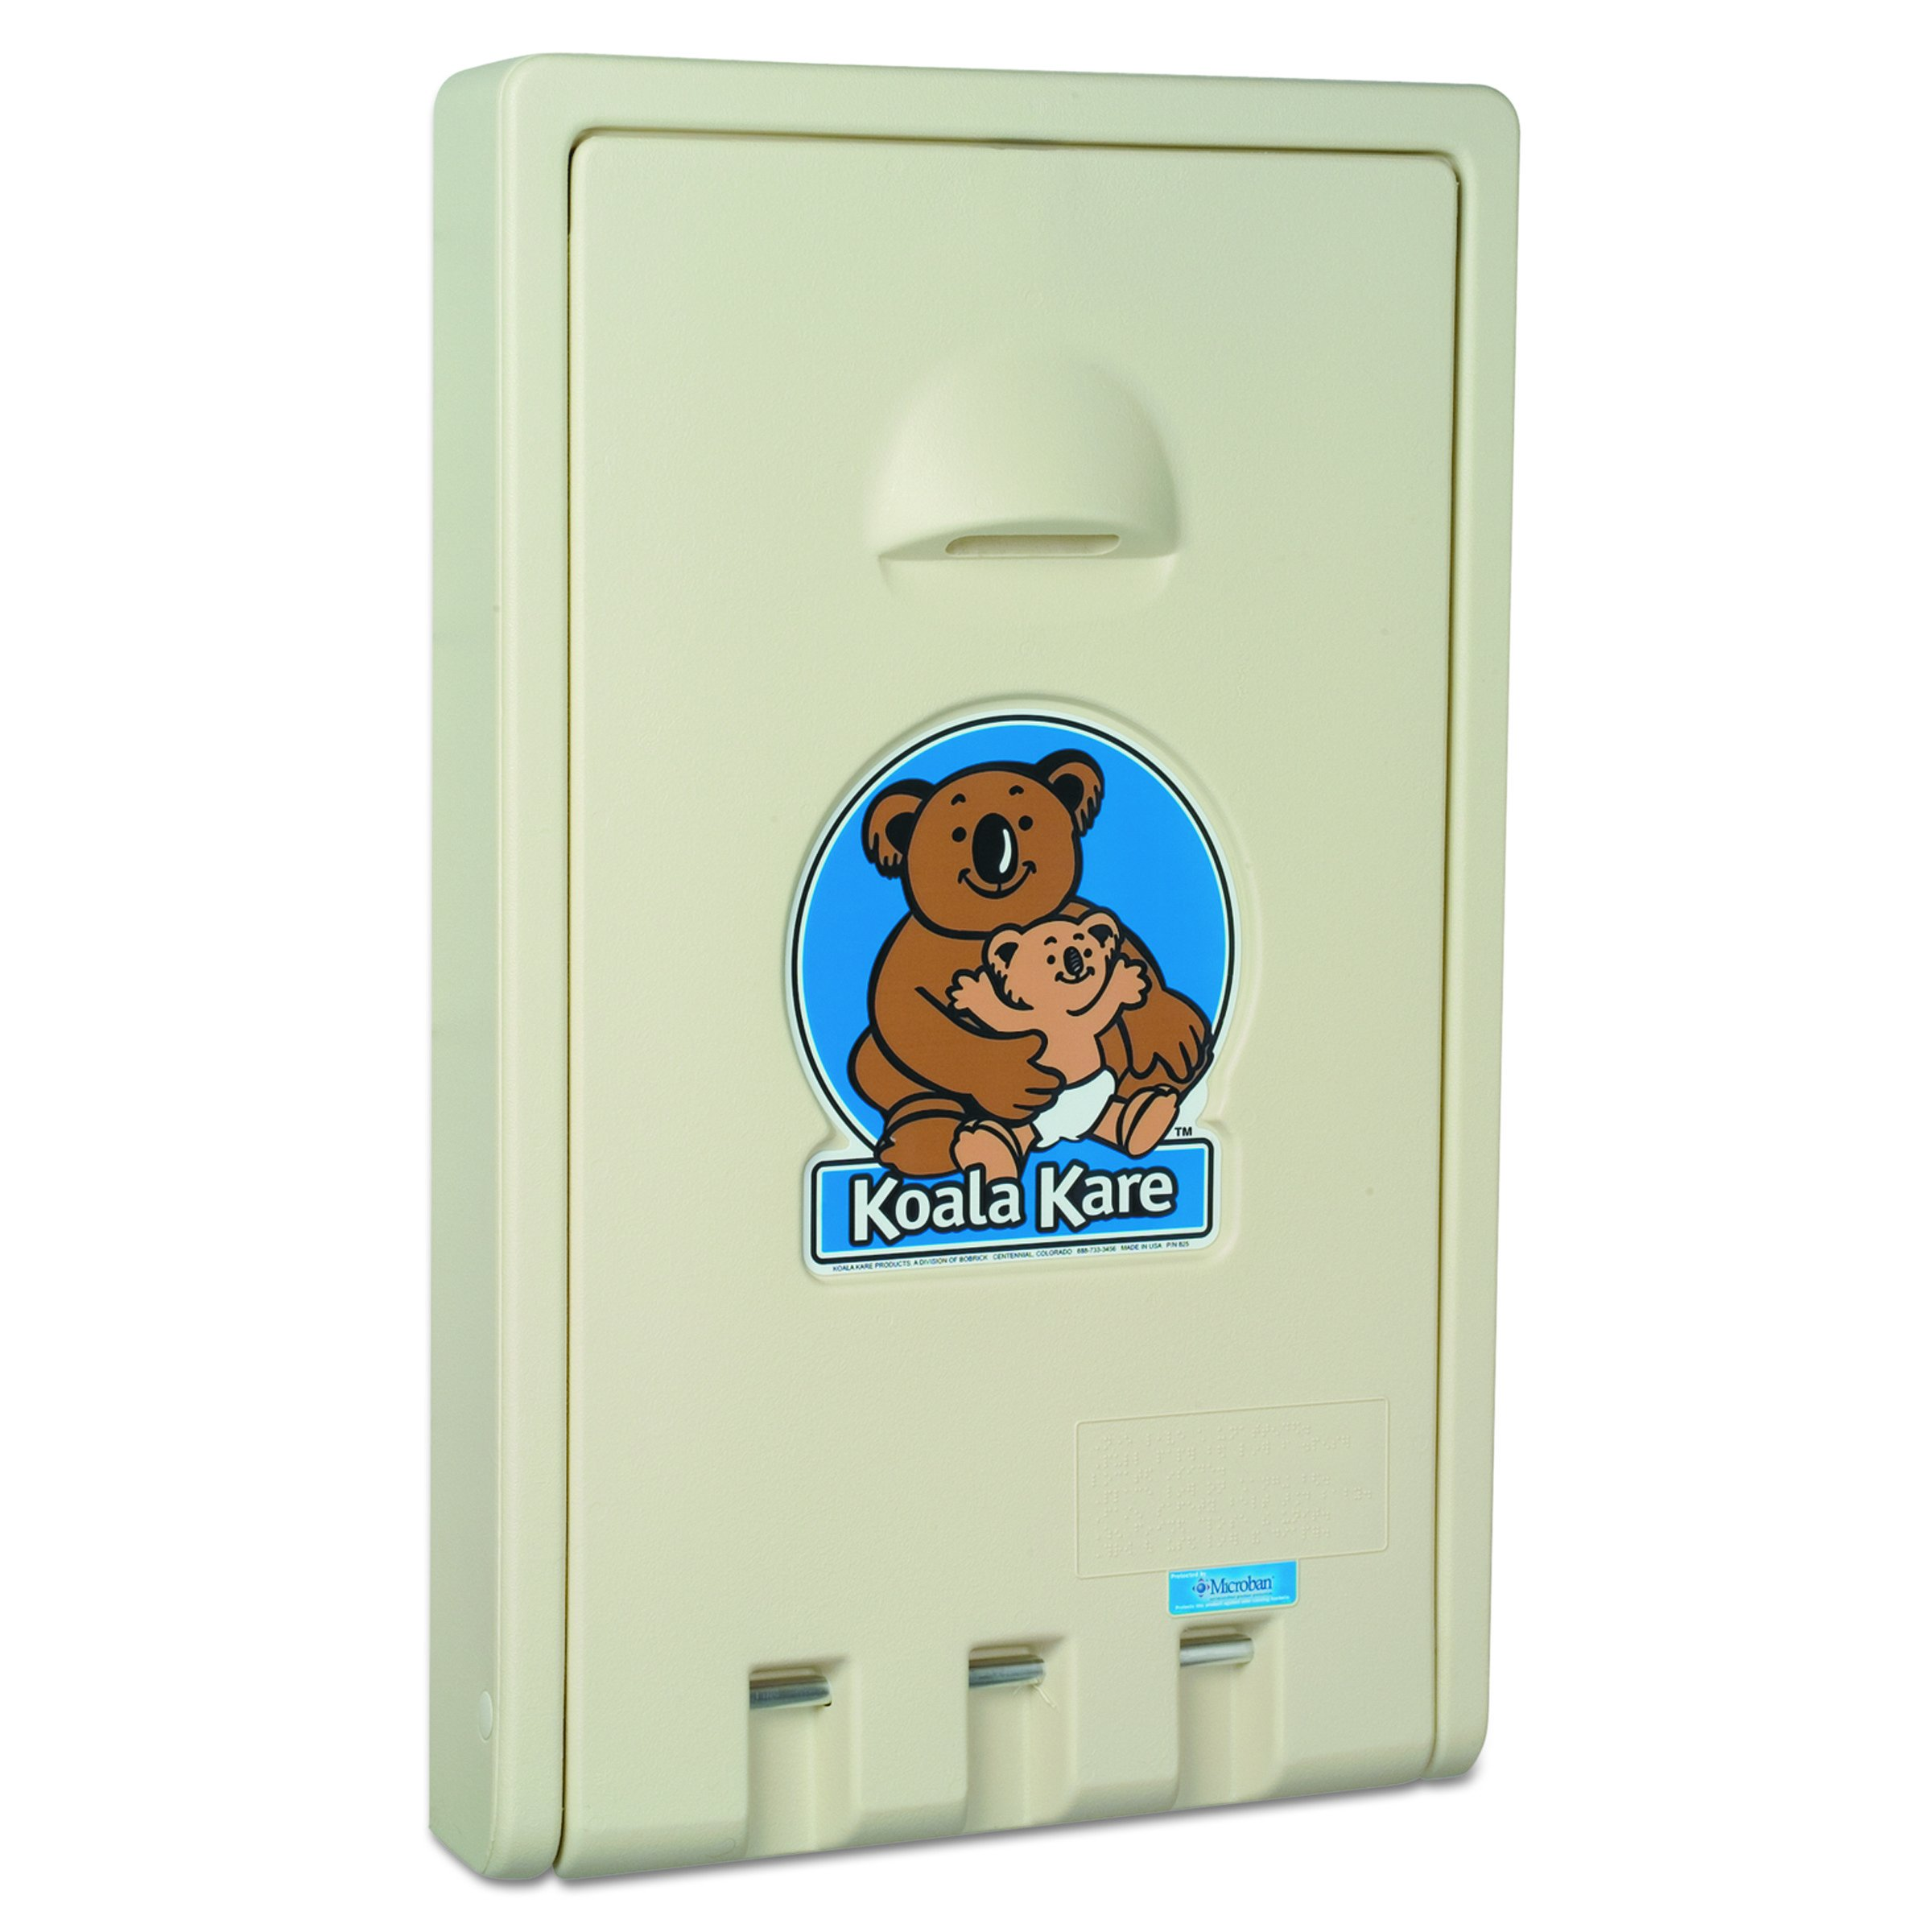 Koala Kare KB10100 Standard Vertical Baby Changing Station, Cream